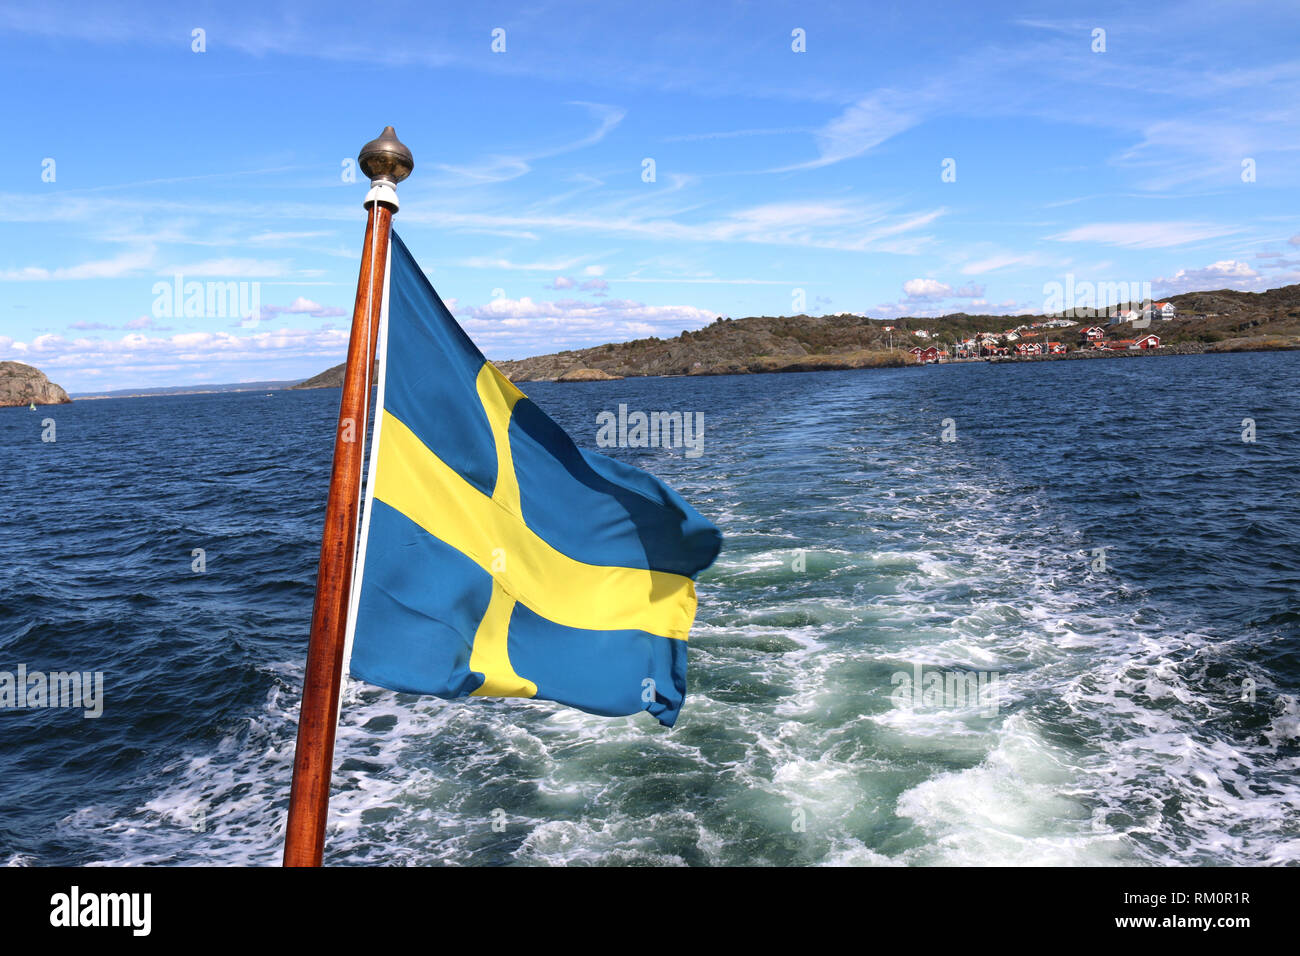 Schwedische Flagge auf einem Schiff, Schweden / drapeau suédois sur un navire, la Suède Banque D'Images